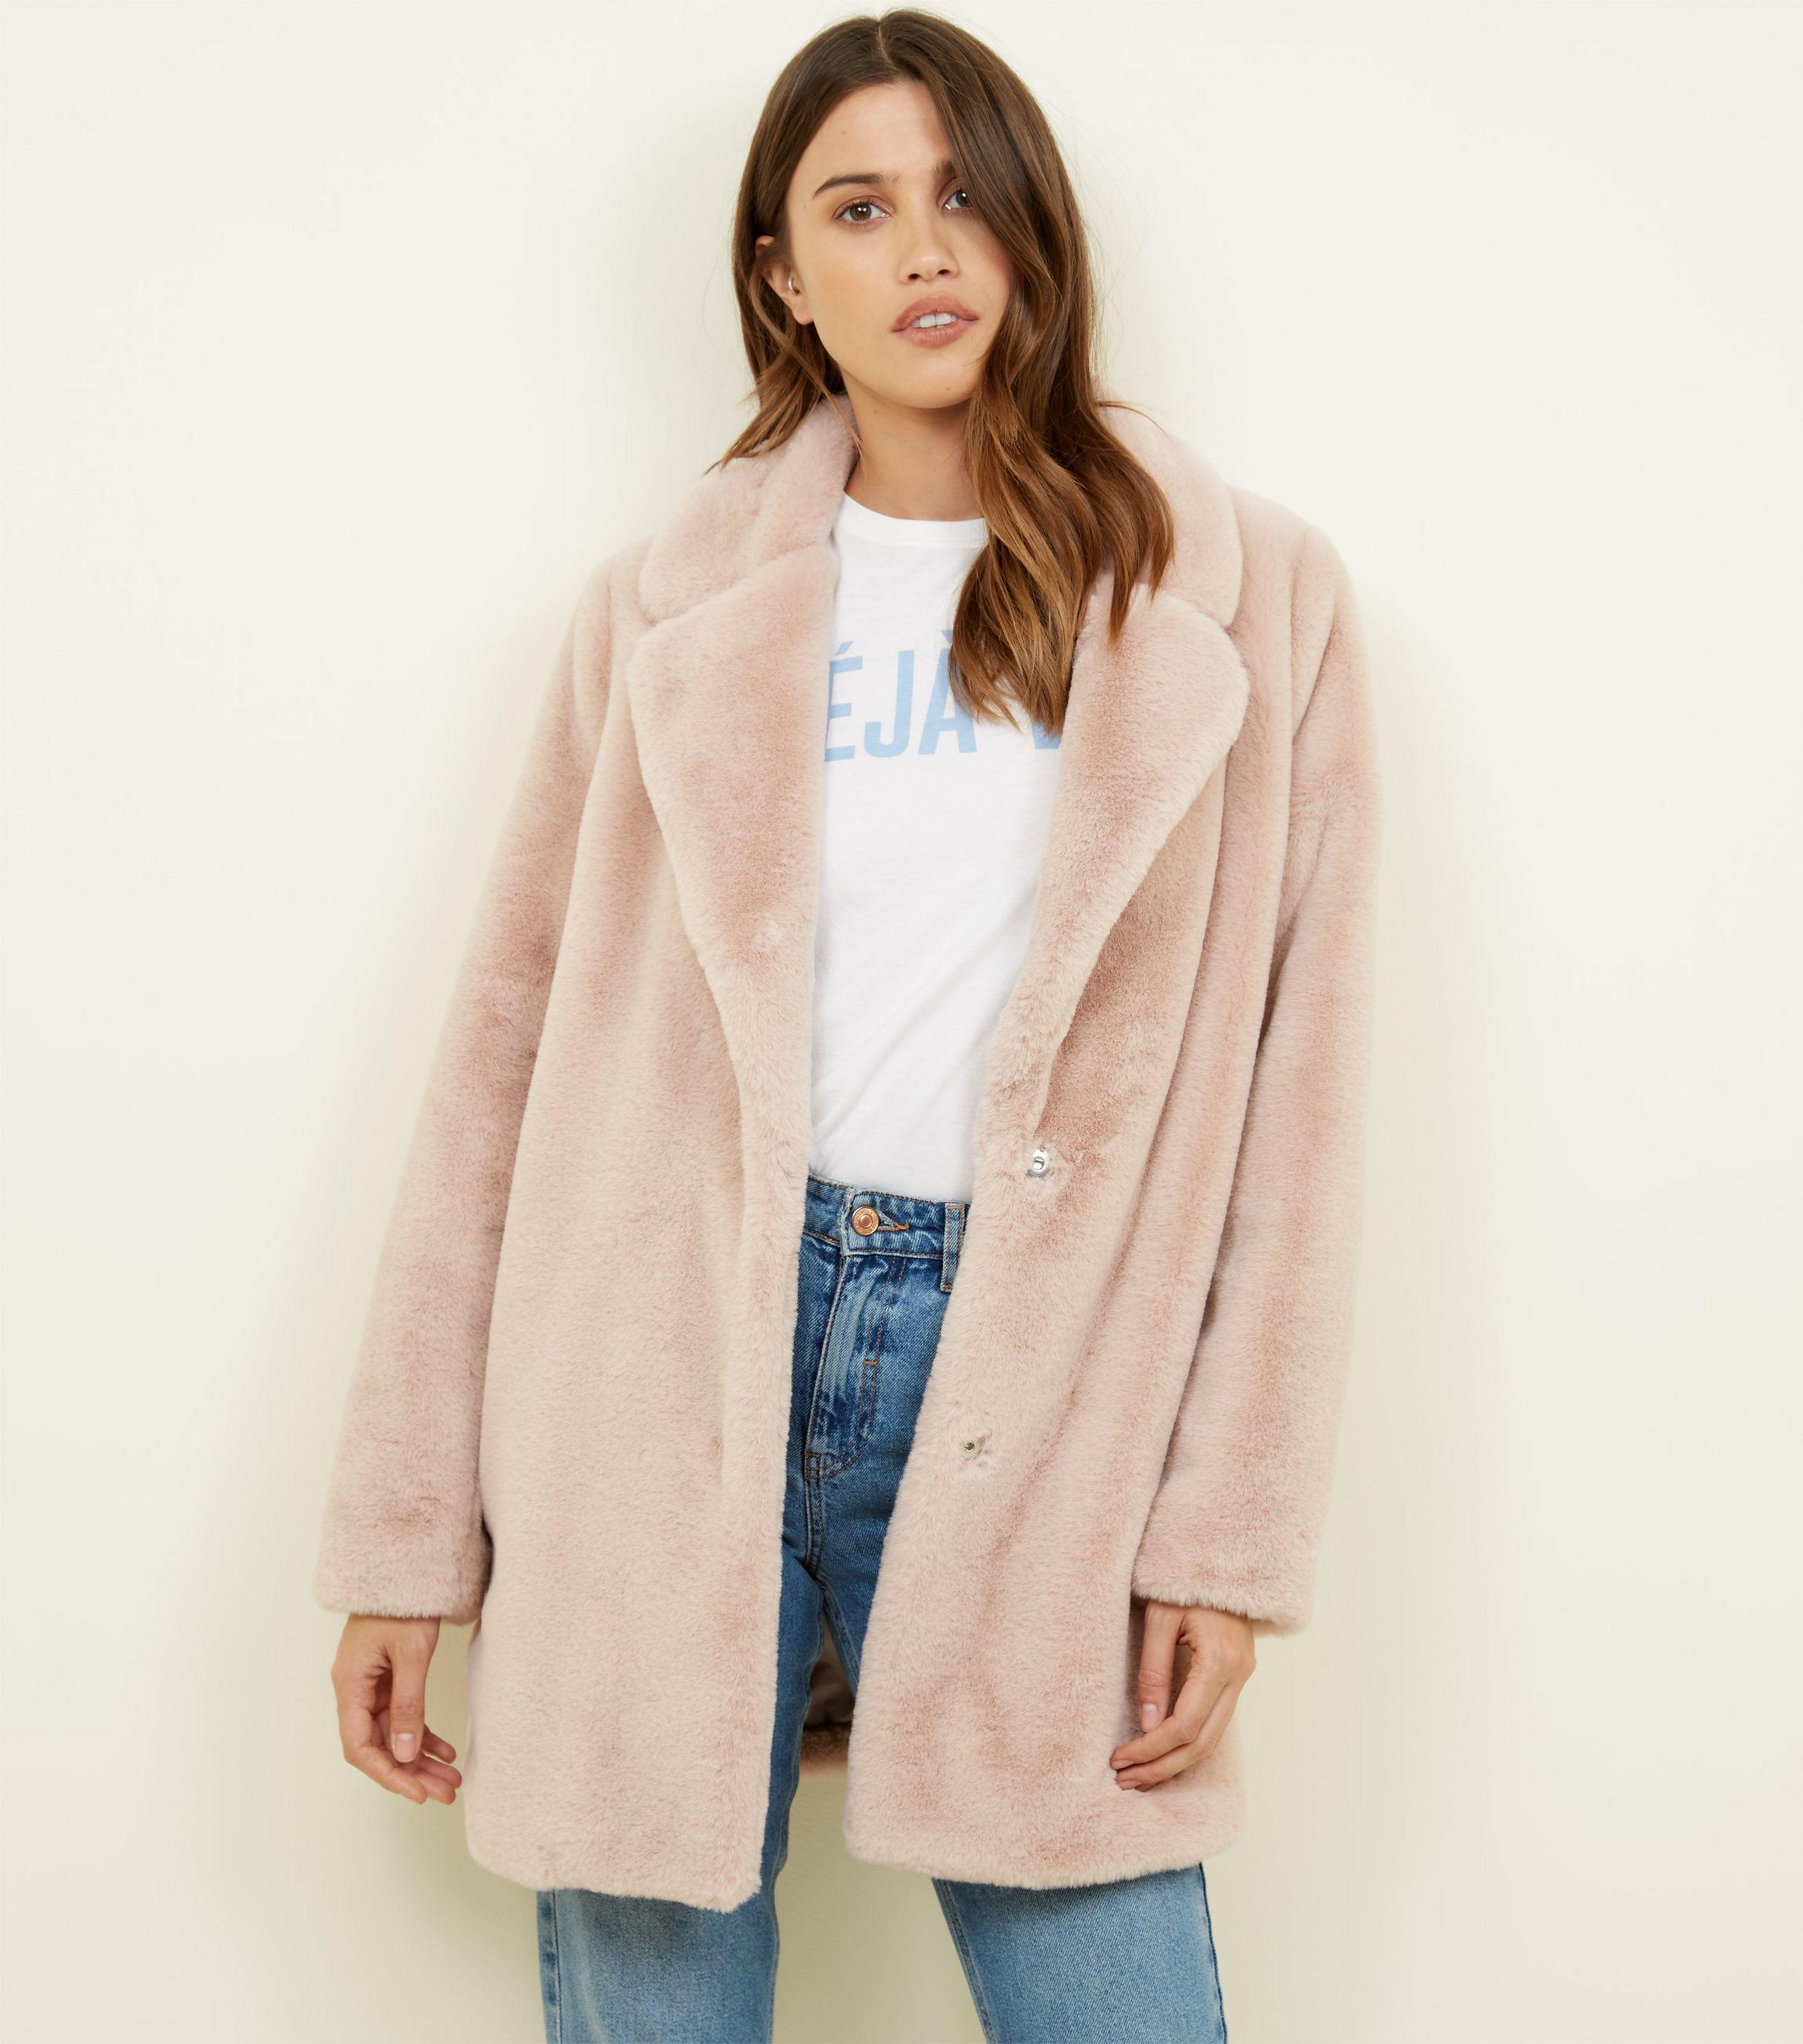 93df9c98e208 New Look Pale Pink Faux Fur Longline Coat in Pink - Lyst